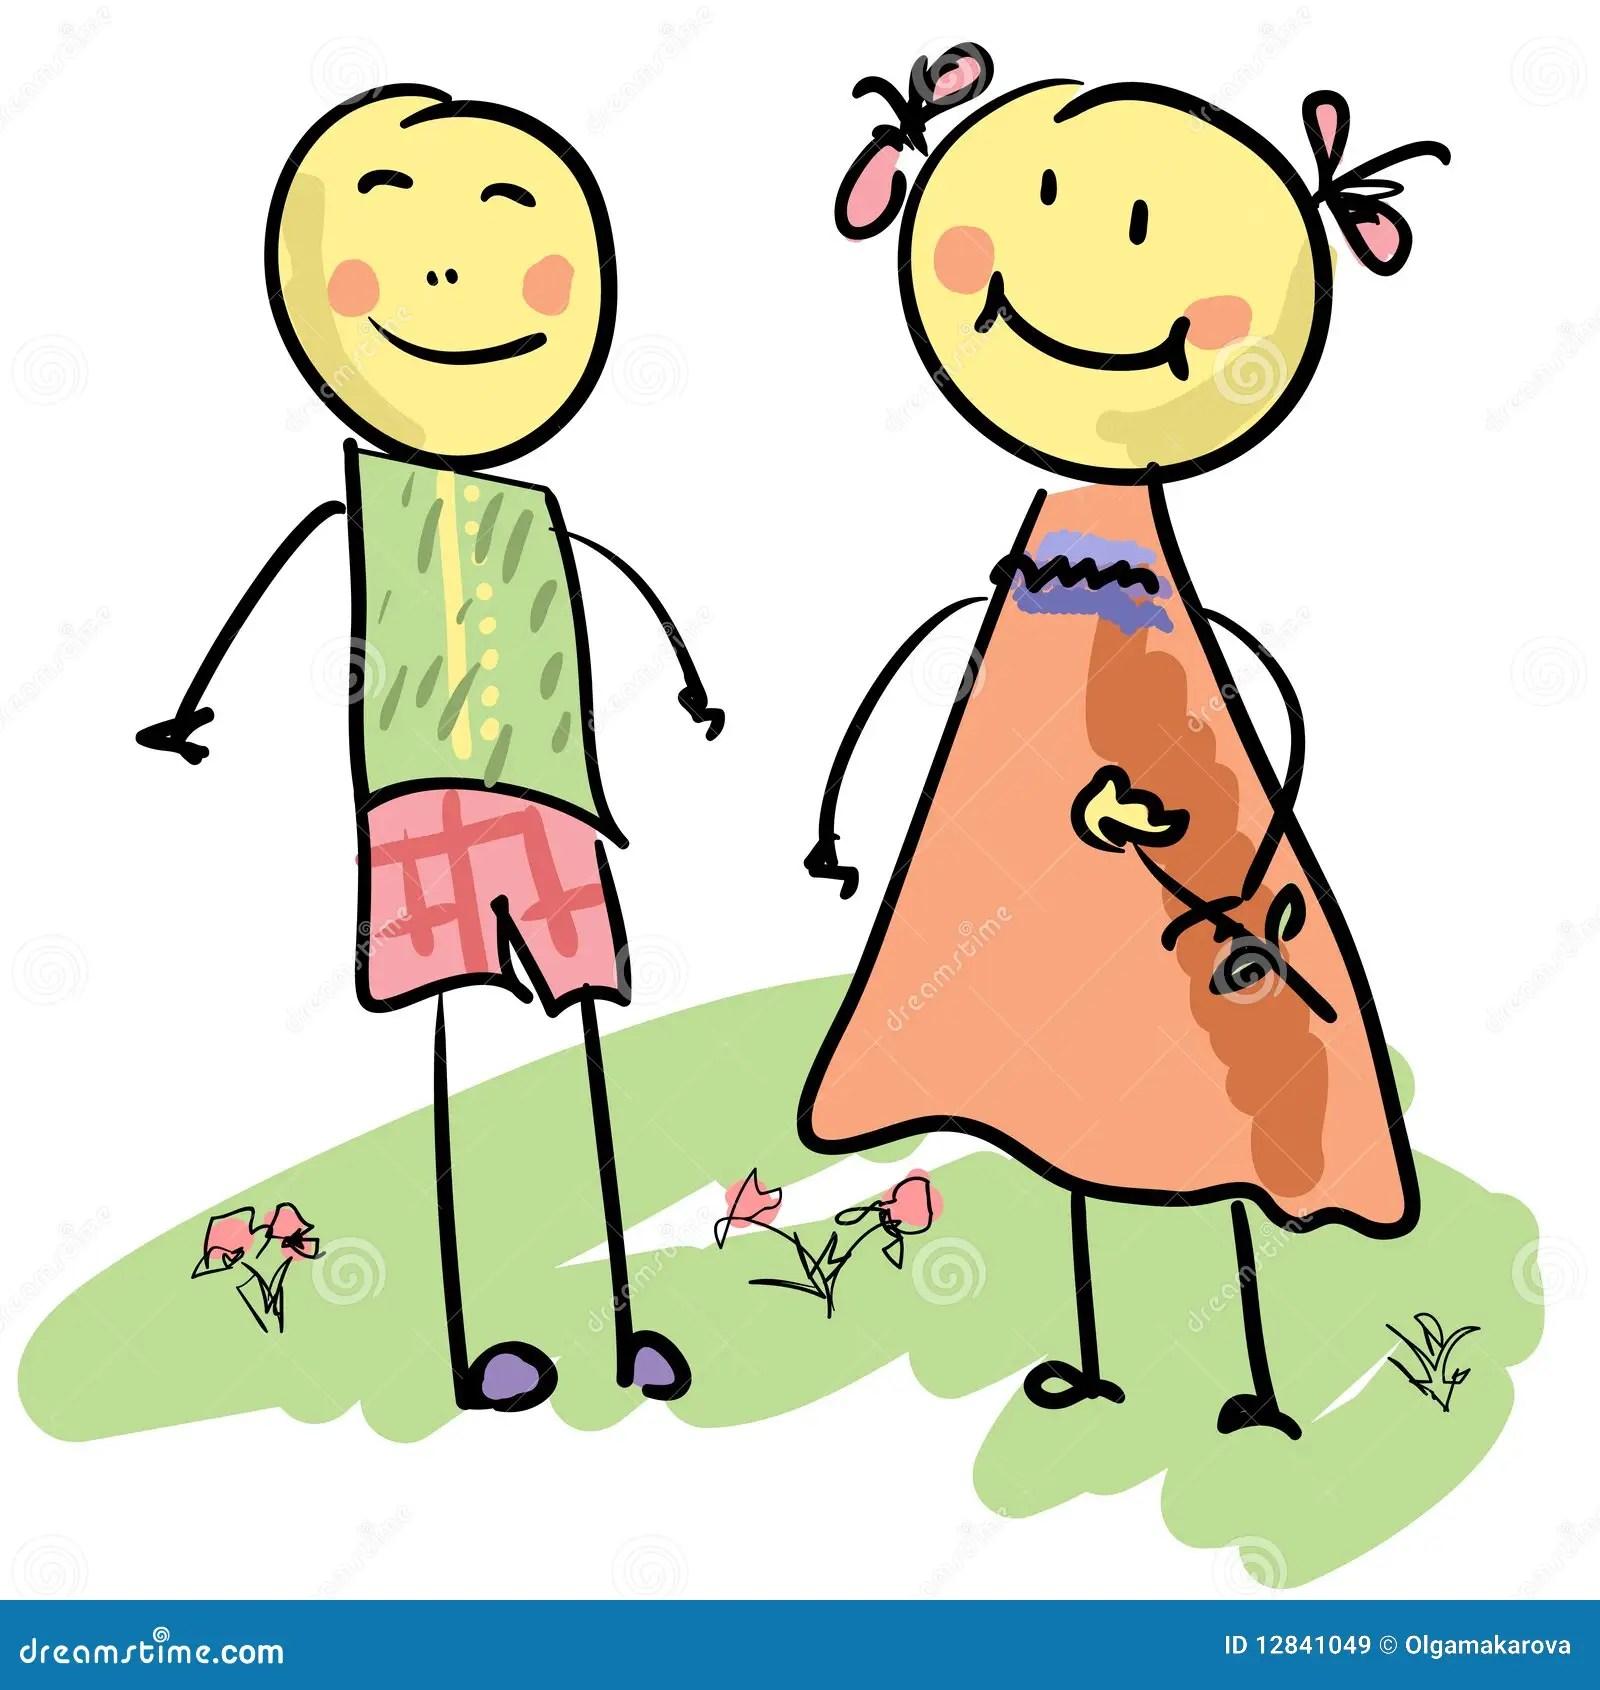 Wallpaper Girl Boy Holding Hands Cute Cartoon Couple Stock Vector Image Of Female Love